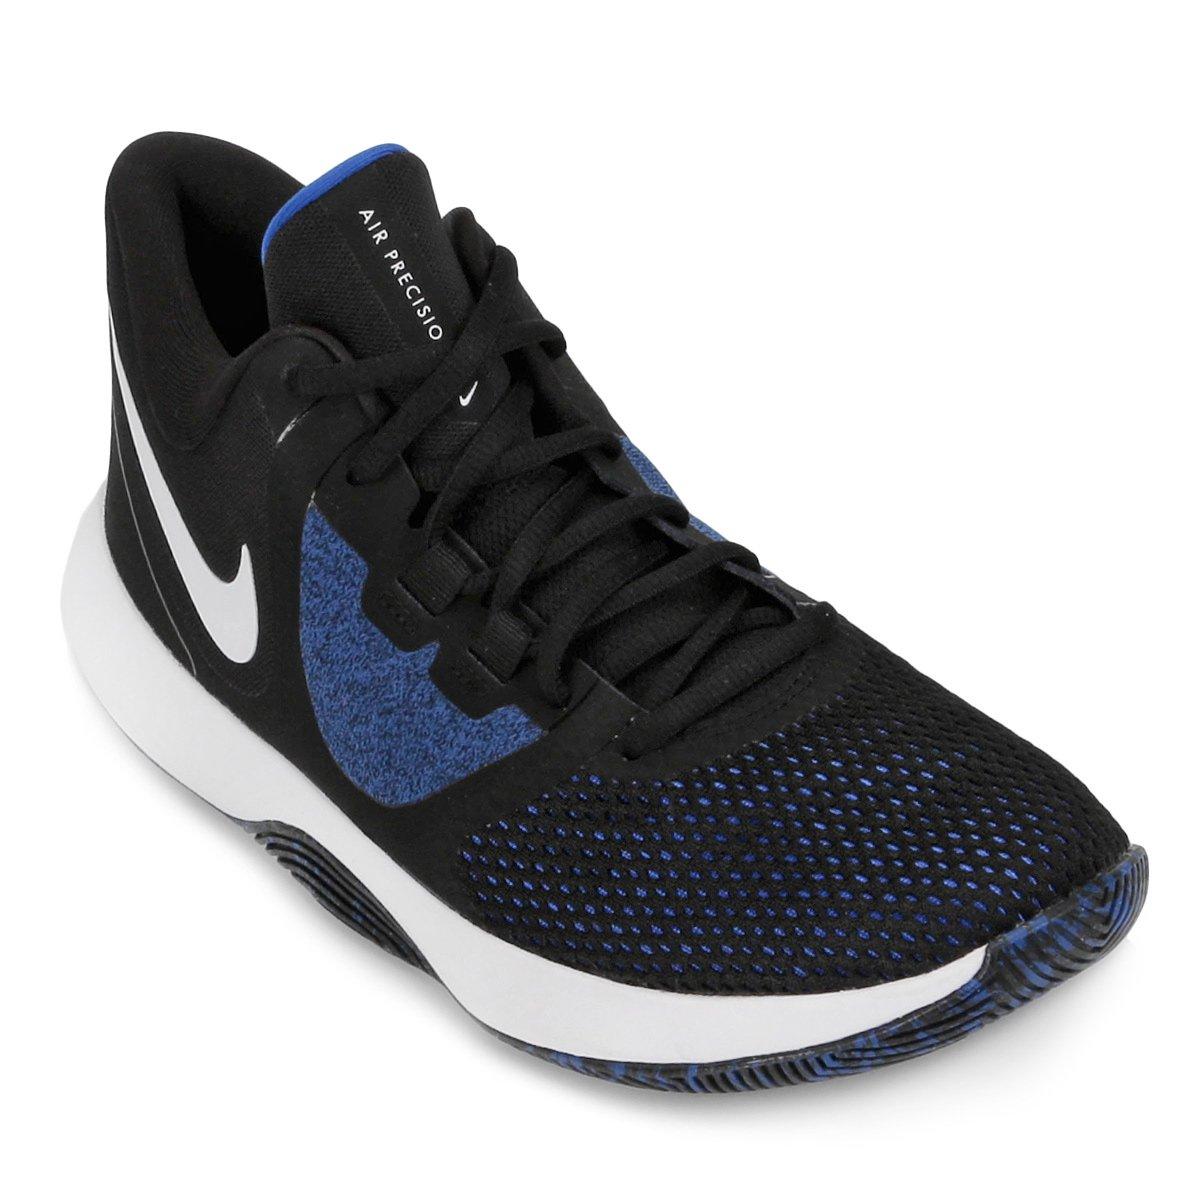 db09cf65e4509 Tênis Nike Air Precision II Masculino - Preto e Azul - Compre Agora ...